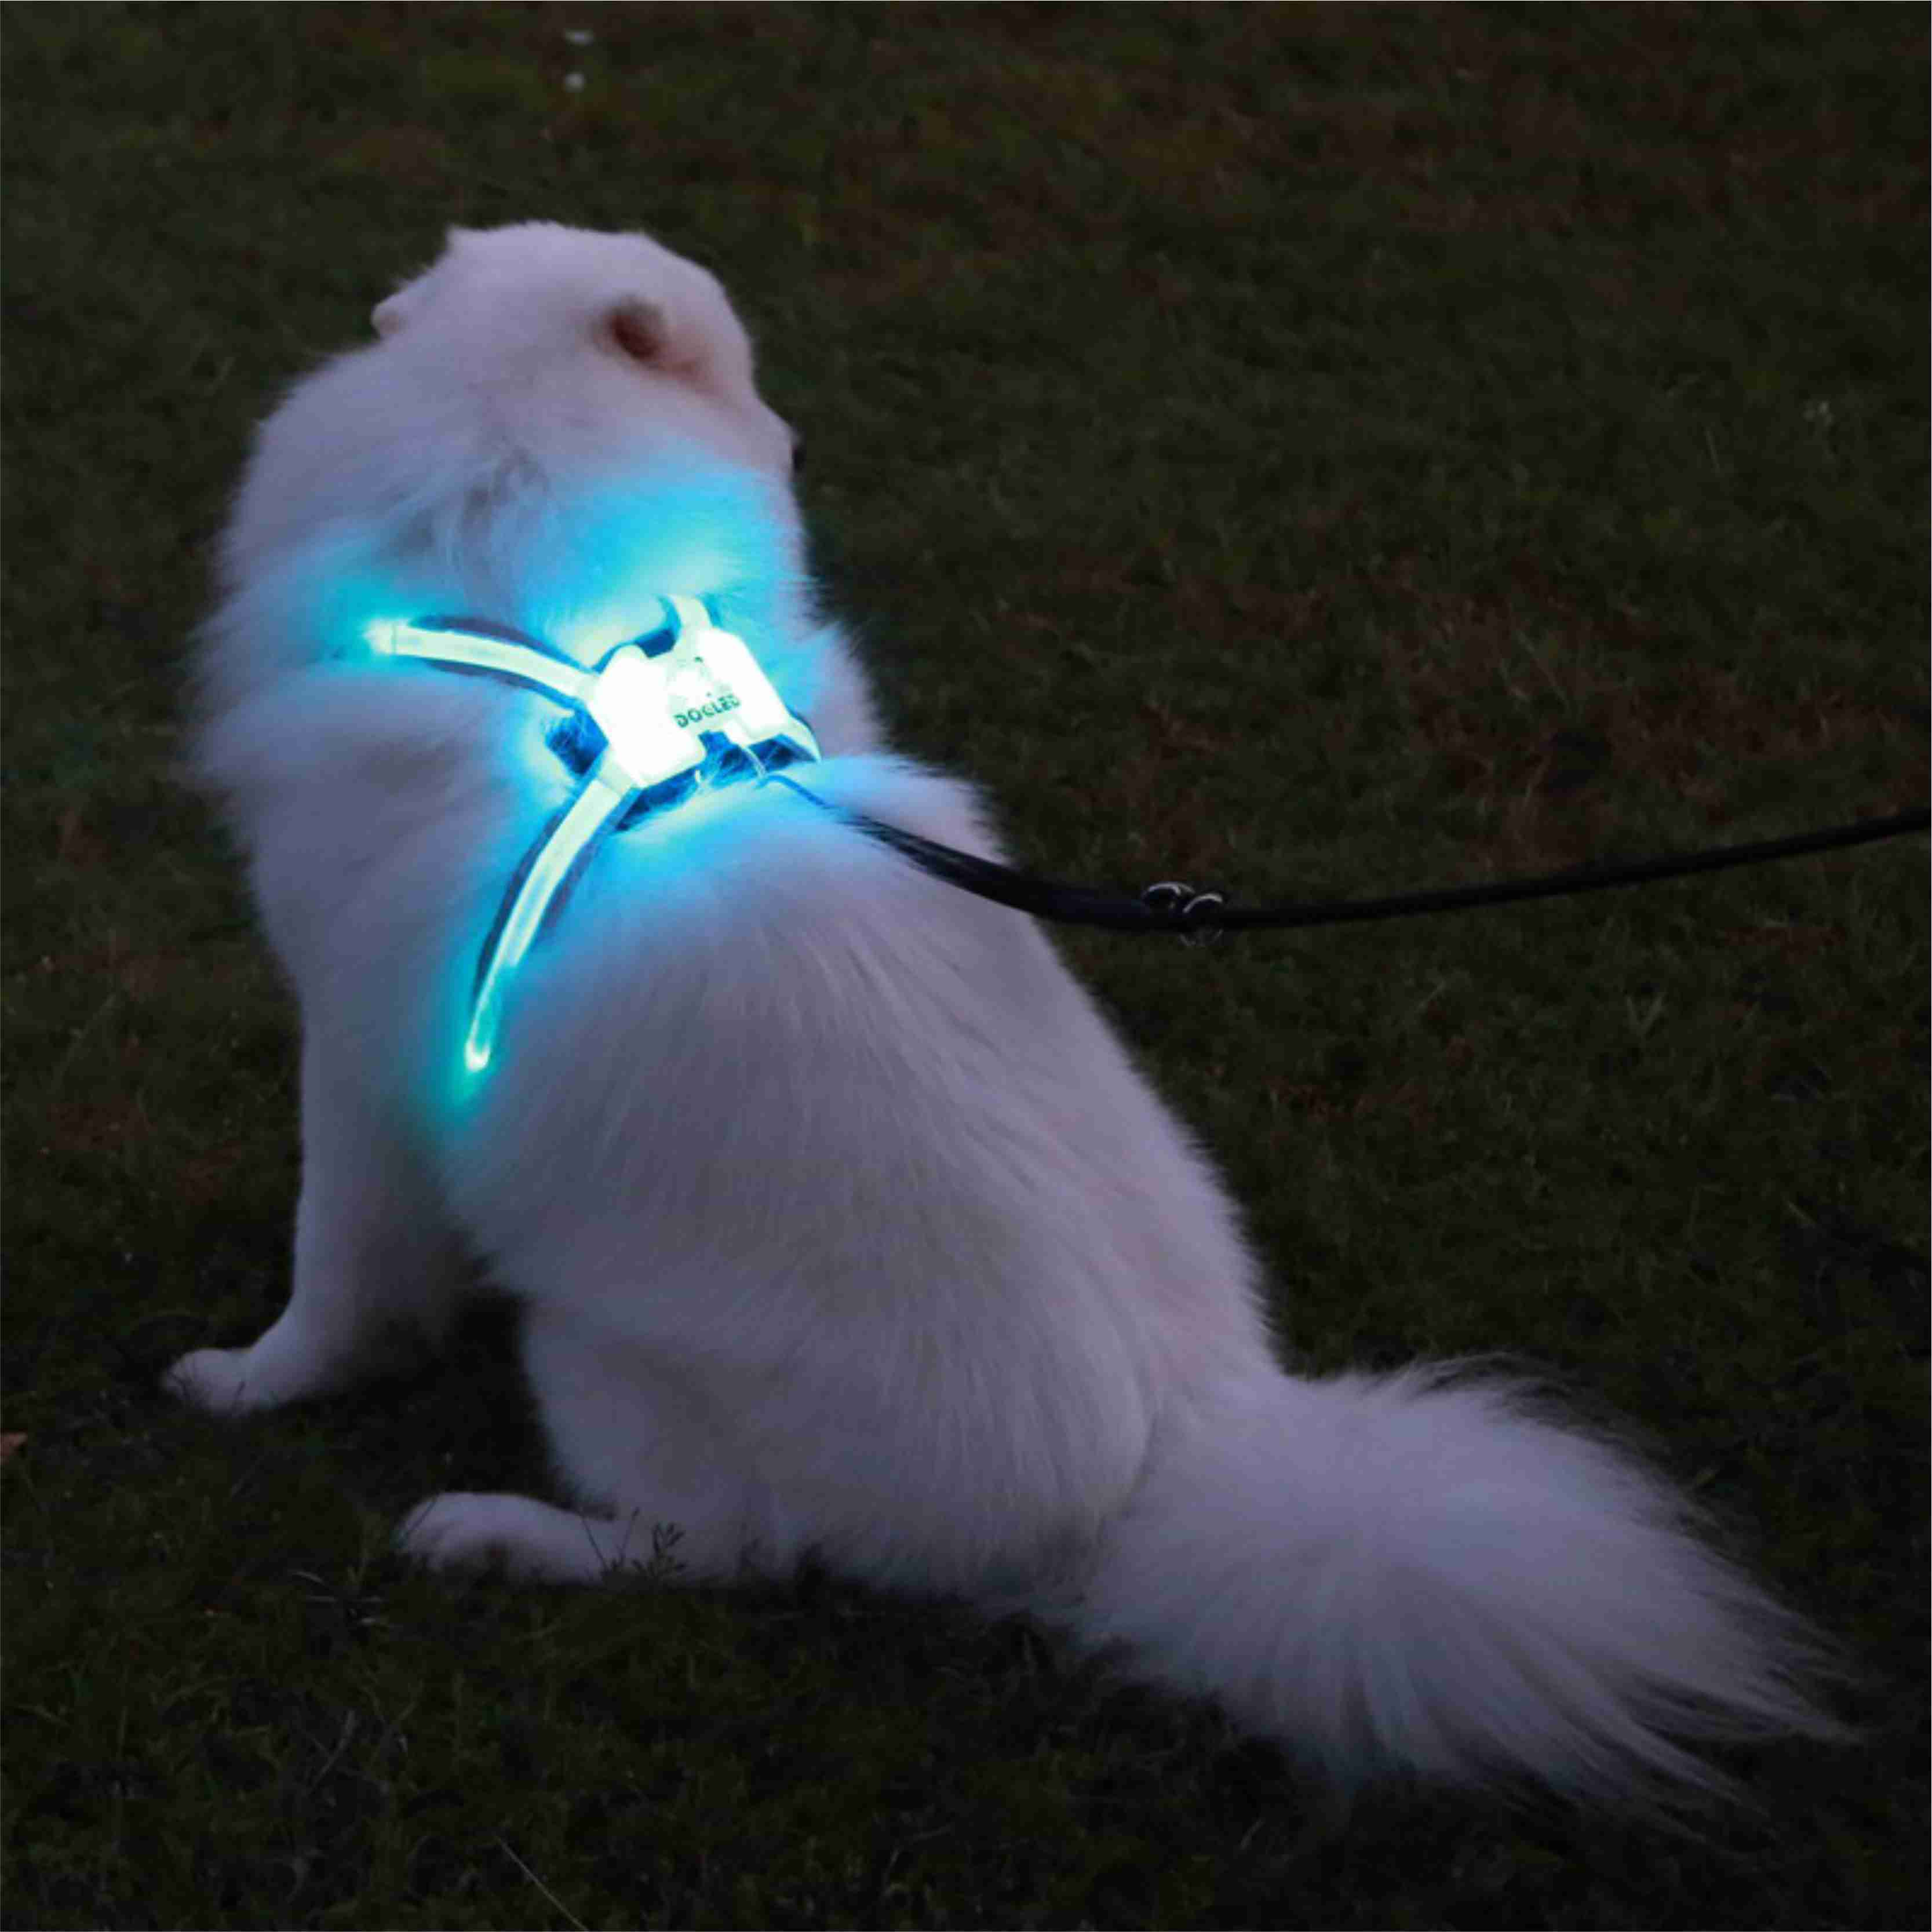 Professional ผลิตสัตว์เลี้ยง LED สายรัดสุนัขใหม่ 2020 รายการโปรด LED สัตว์เลี้ยงสุนัข Cat Harness และสายจูงการฝึกอบรมปลอดภัย